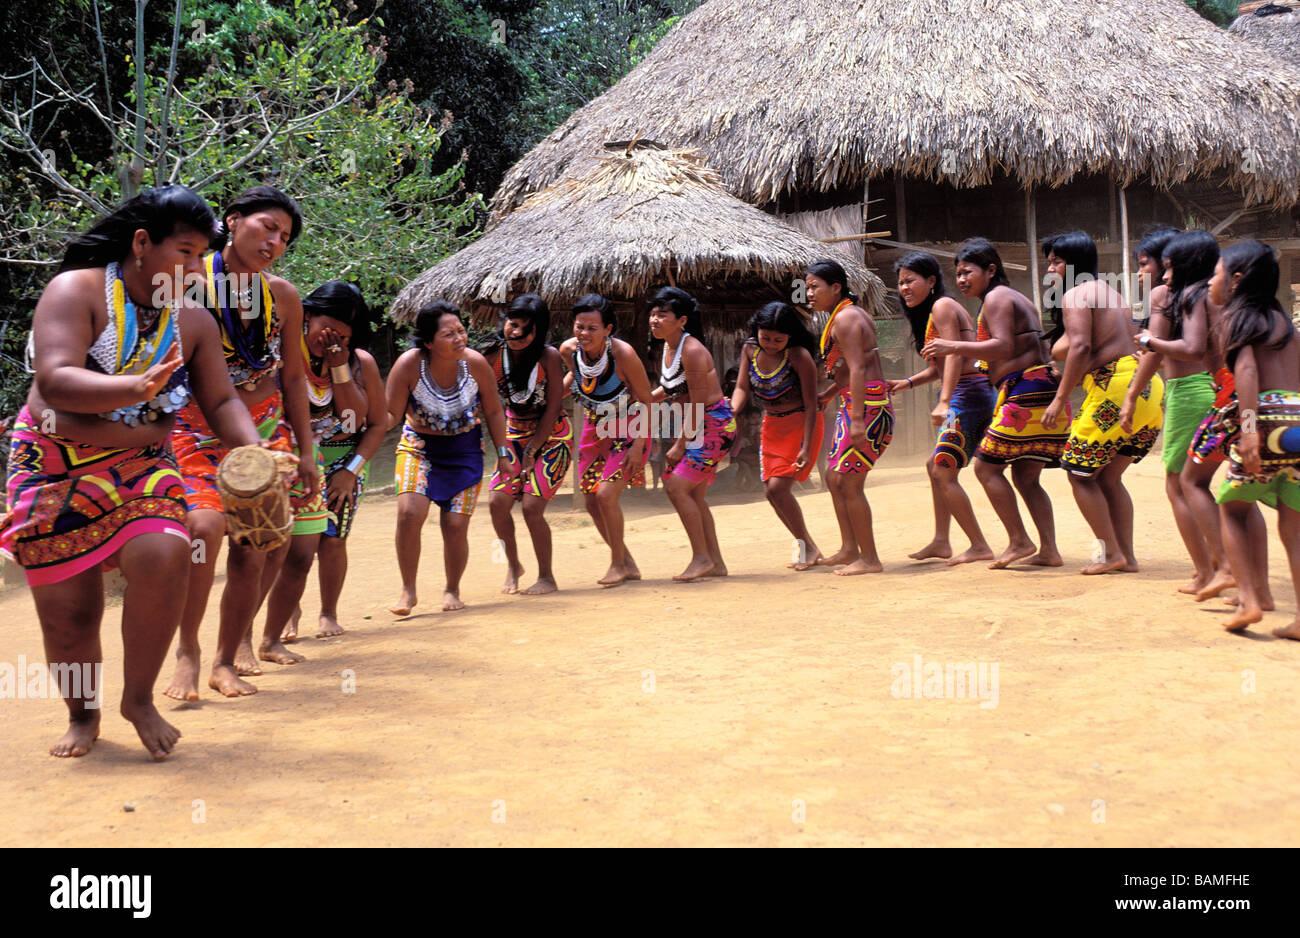 Panama, Panama and Colon Provinces, Chagres National Park, Parque Nacional Chagres, Embera Indians dancing - Stock Image